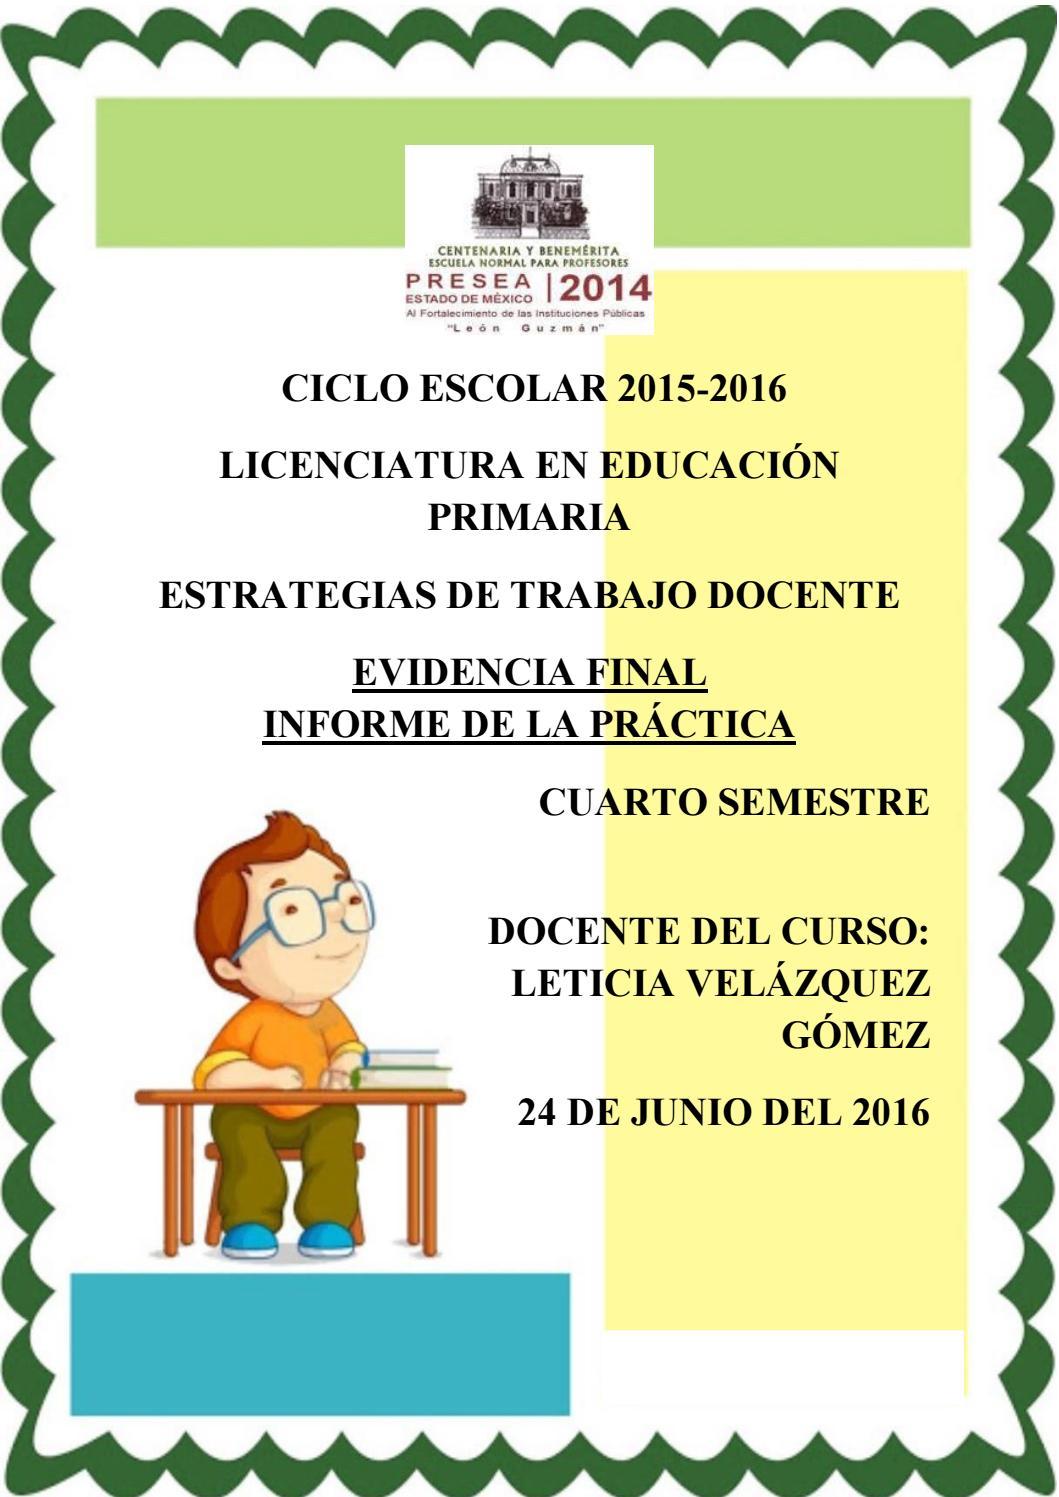 Evidencia final: Informe de práctica by Diana Gpe. Hernandez - issuu